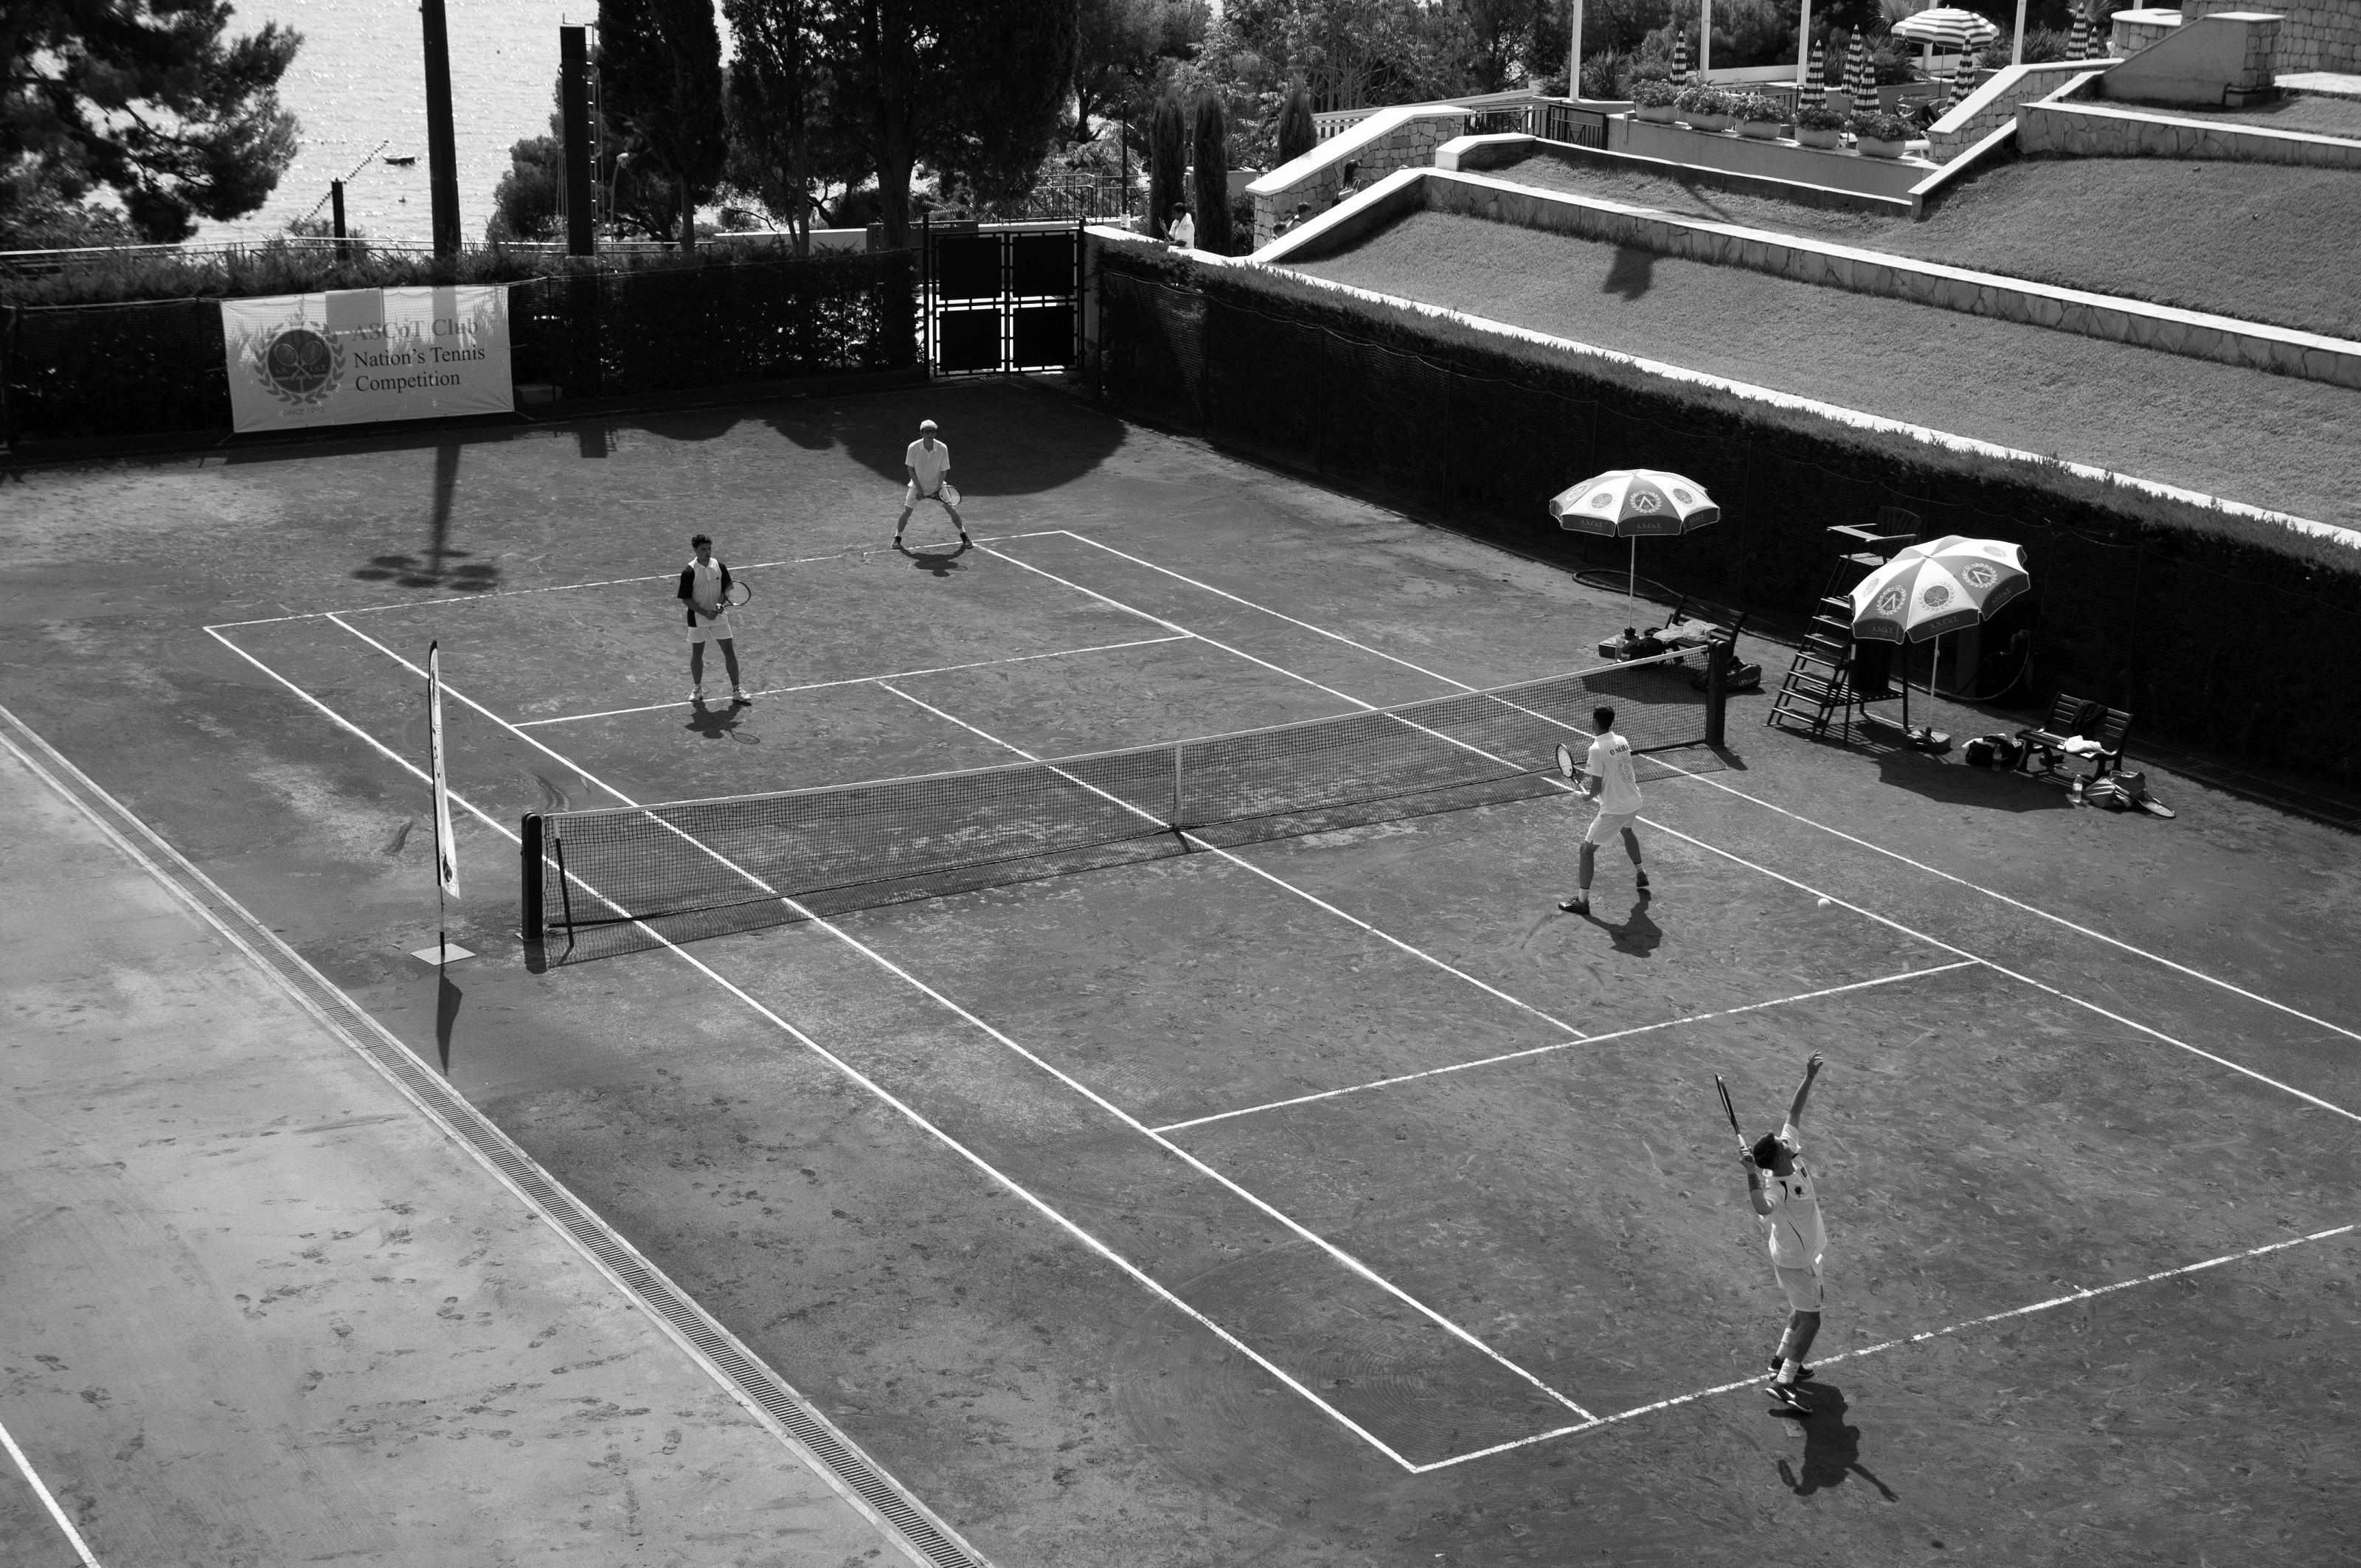 Ascotian Club, tennis court